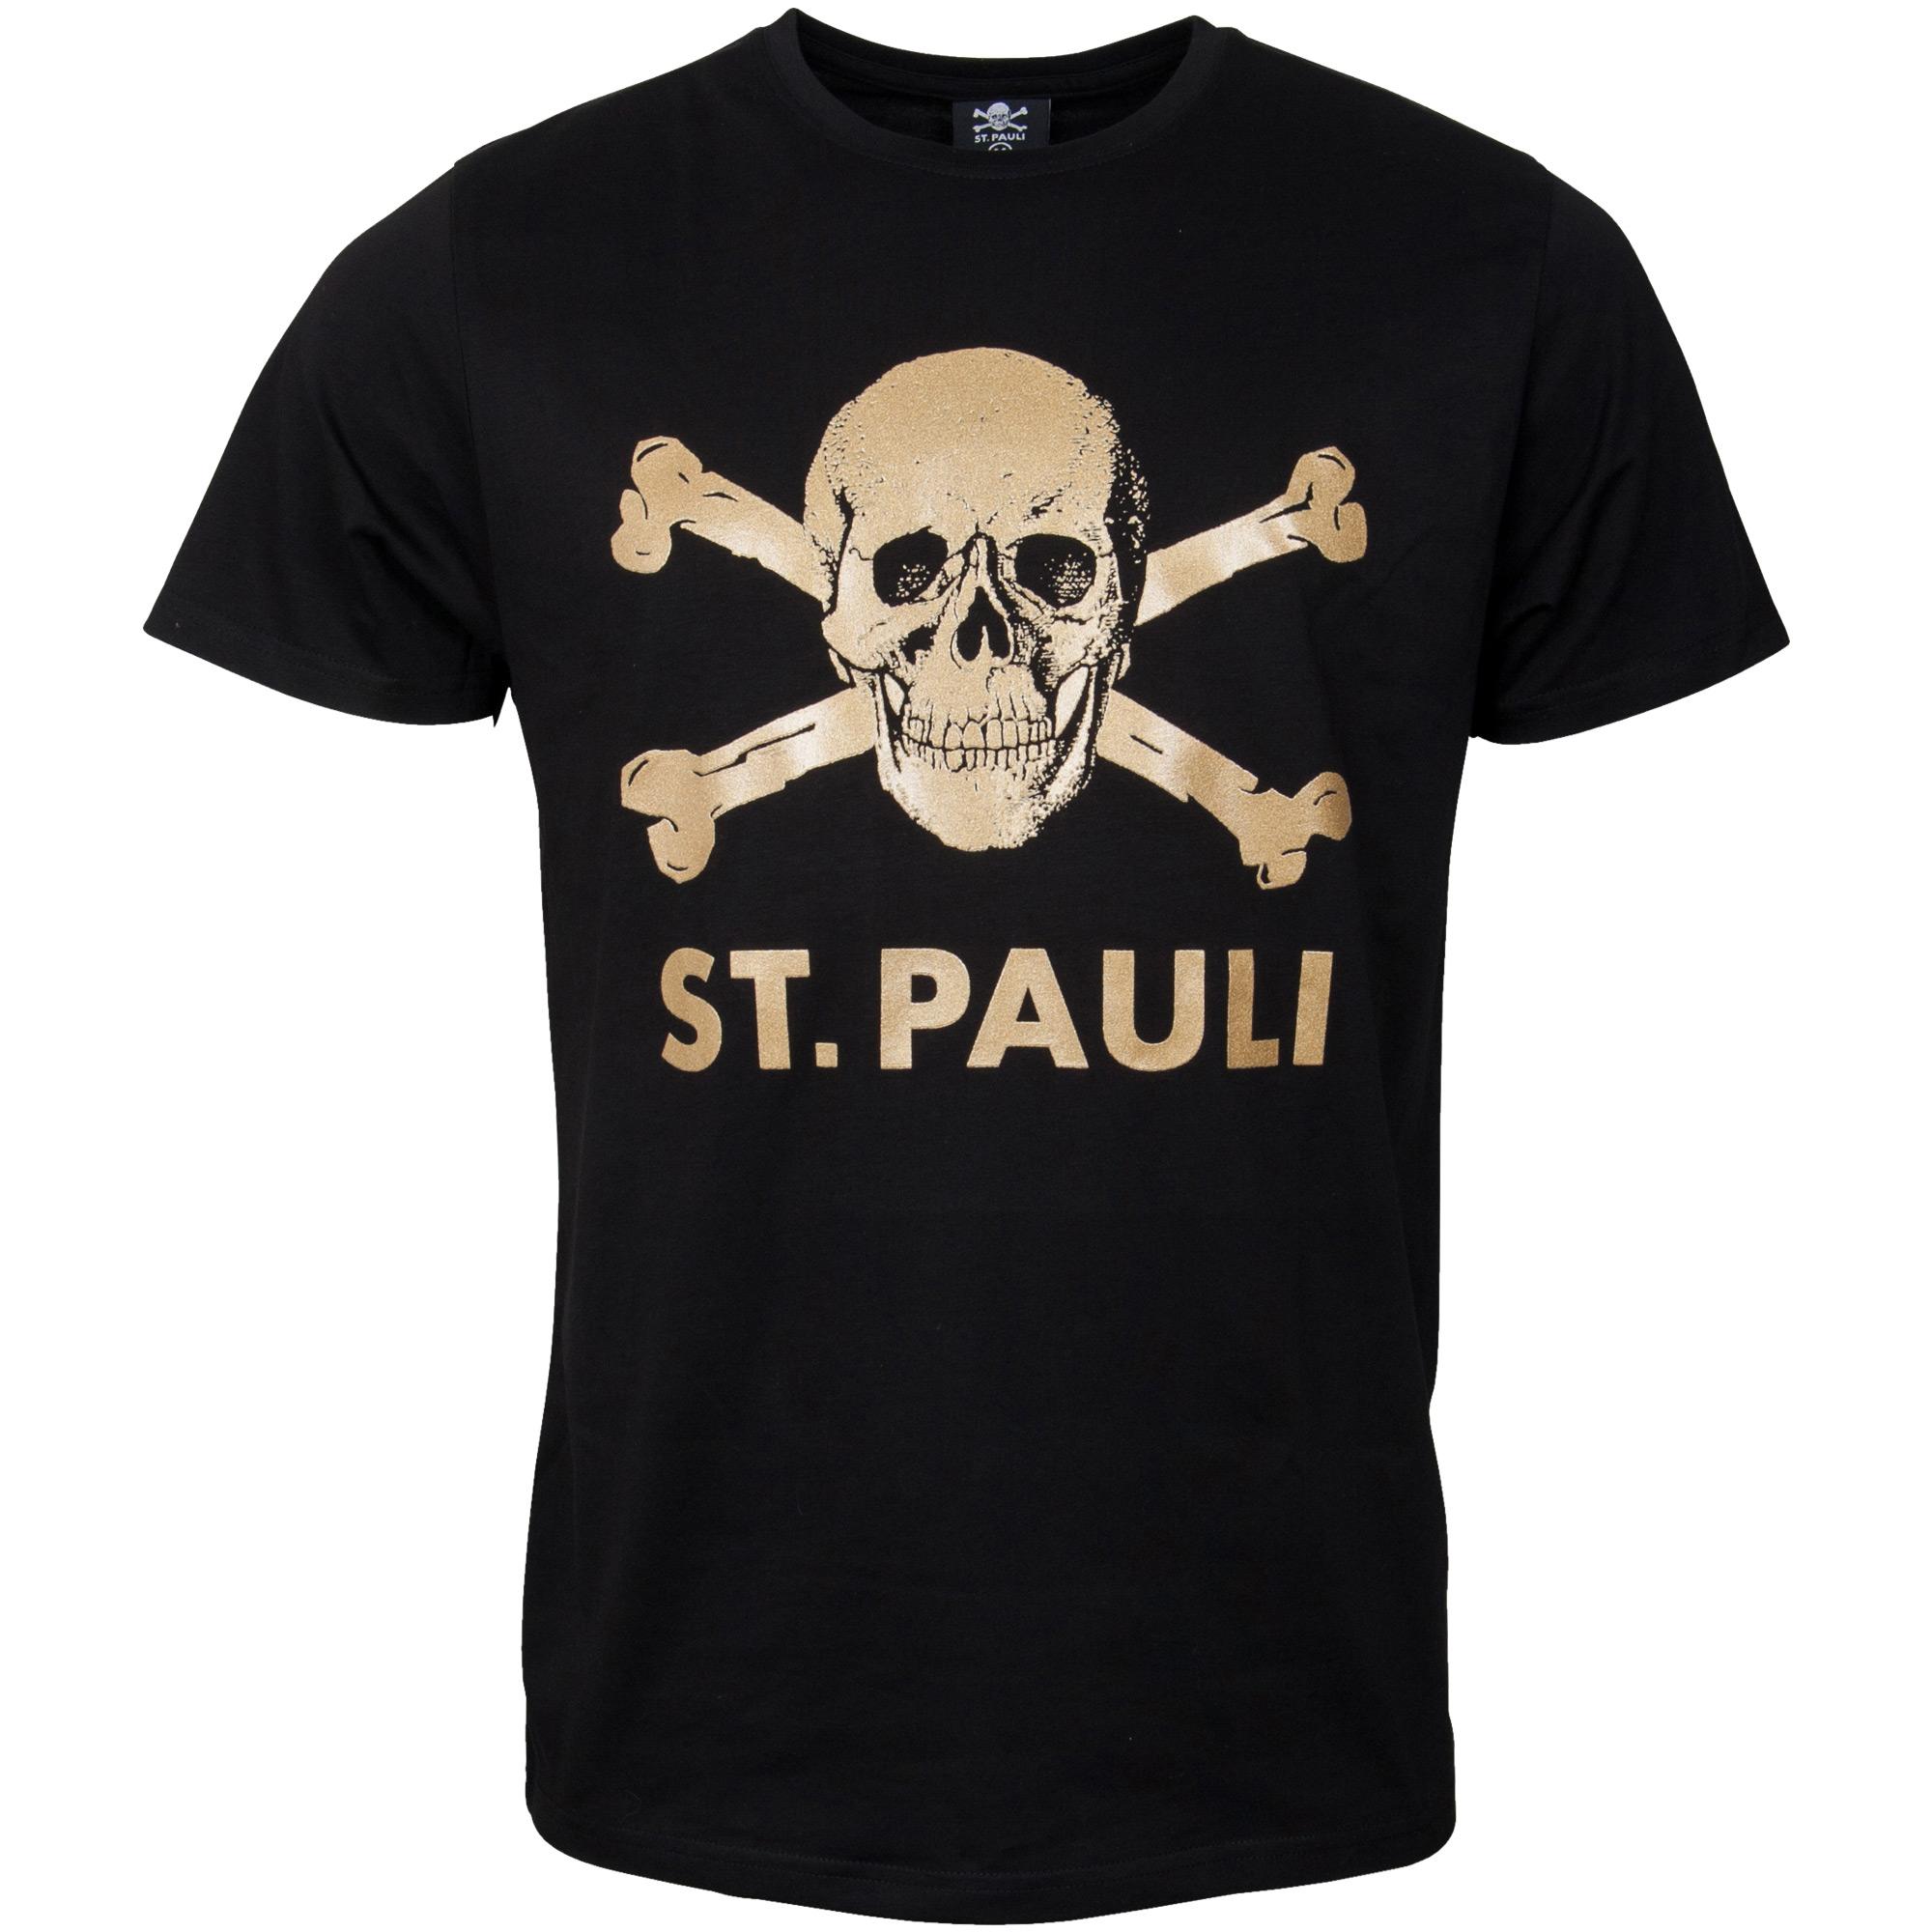 FC St. Pauli - T-Shirt Totenkopf Schwarz-Gold